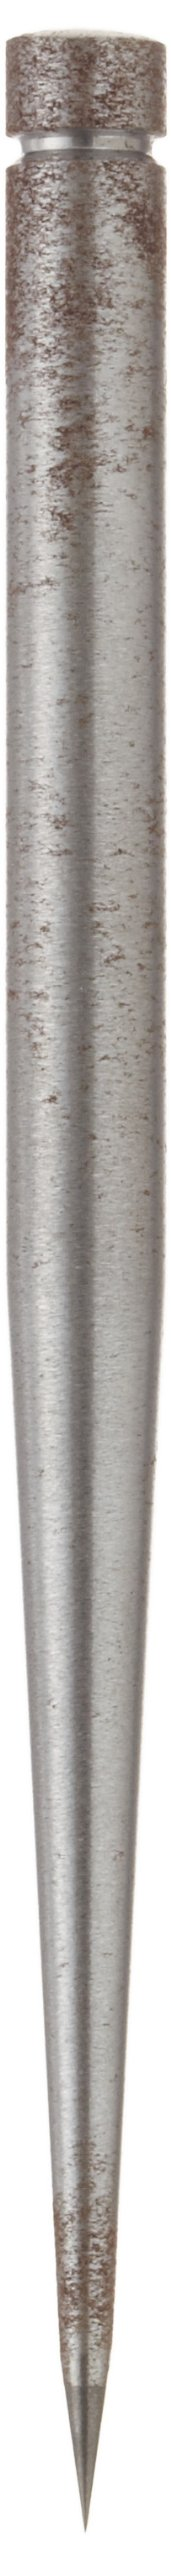 Starrett PT19306 Carbide Point For Pocket Scriber No. 70BX by Starrett